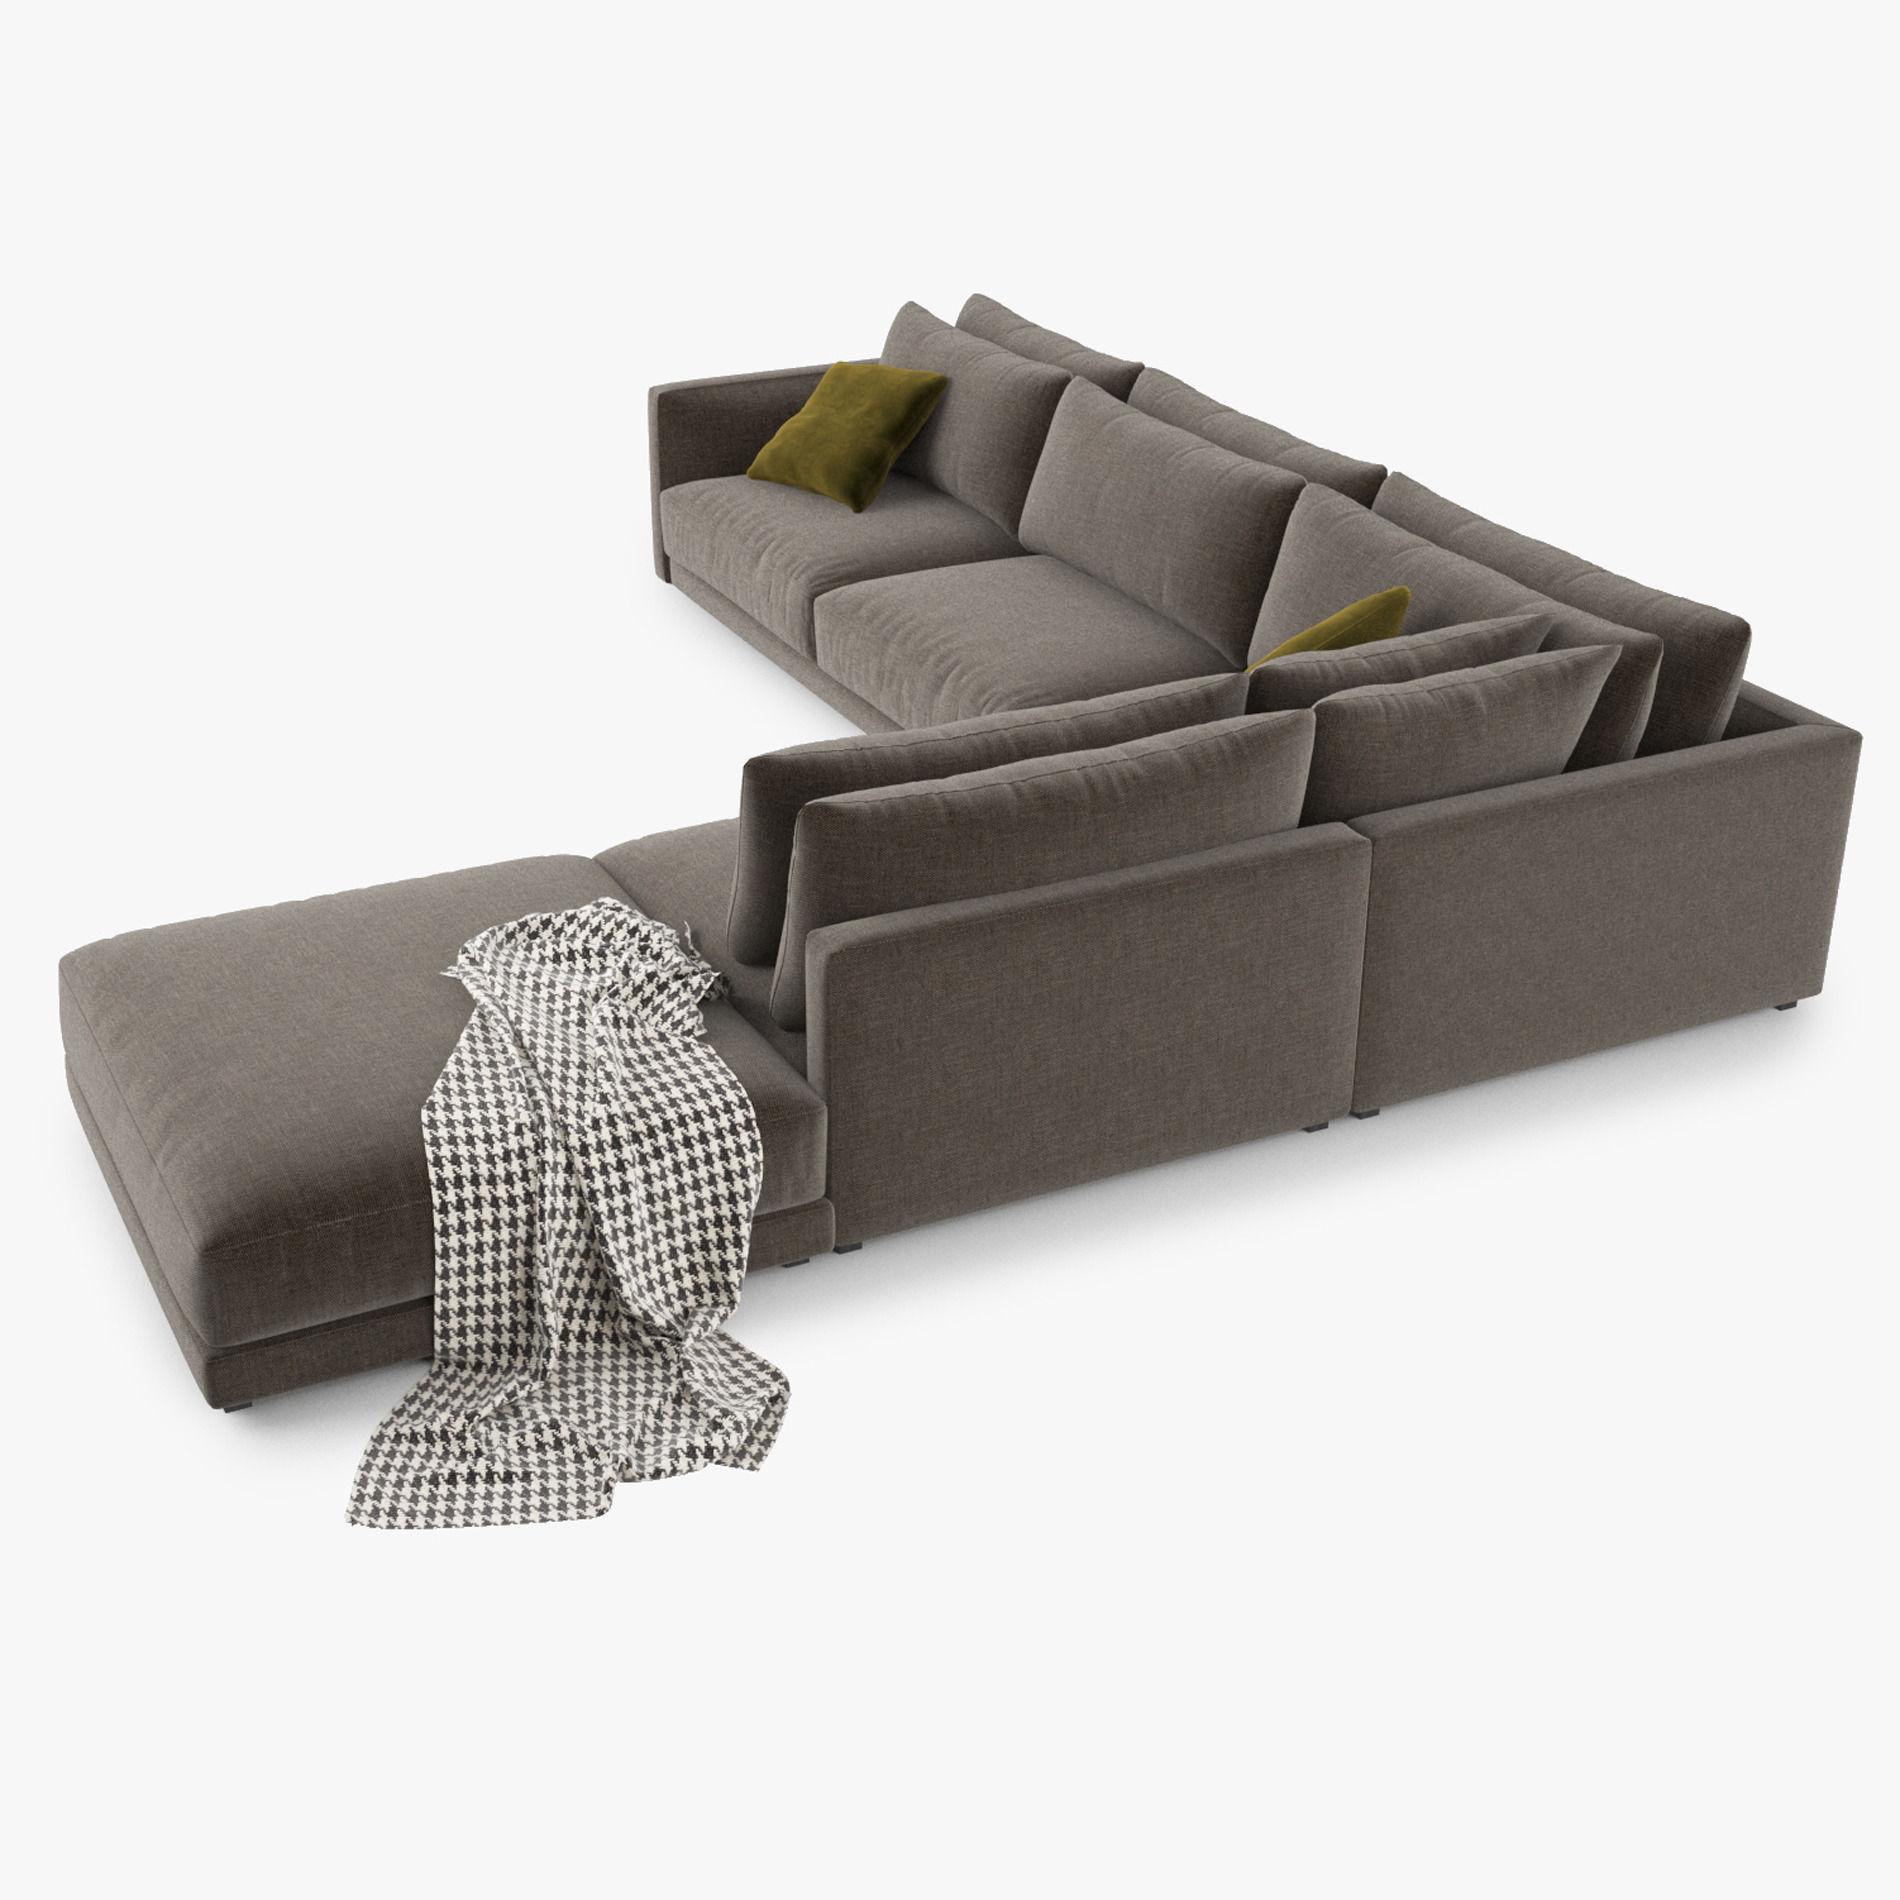 bristol sofa poliform preis. Black Bedroom Furniture Sets. Home Design Ideas